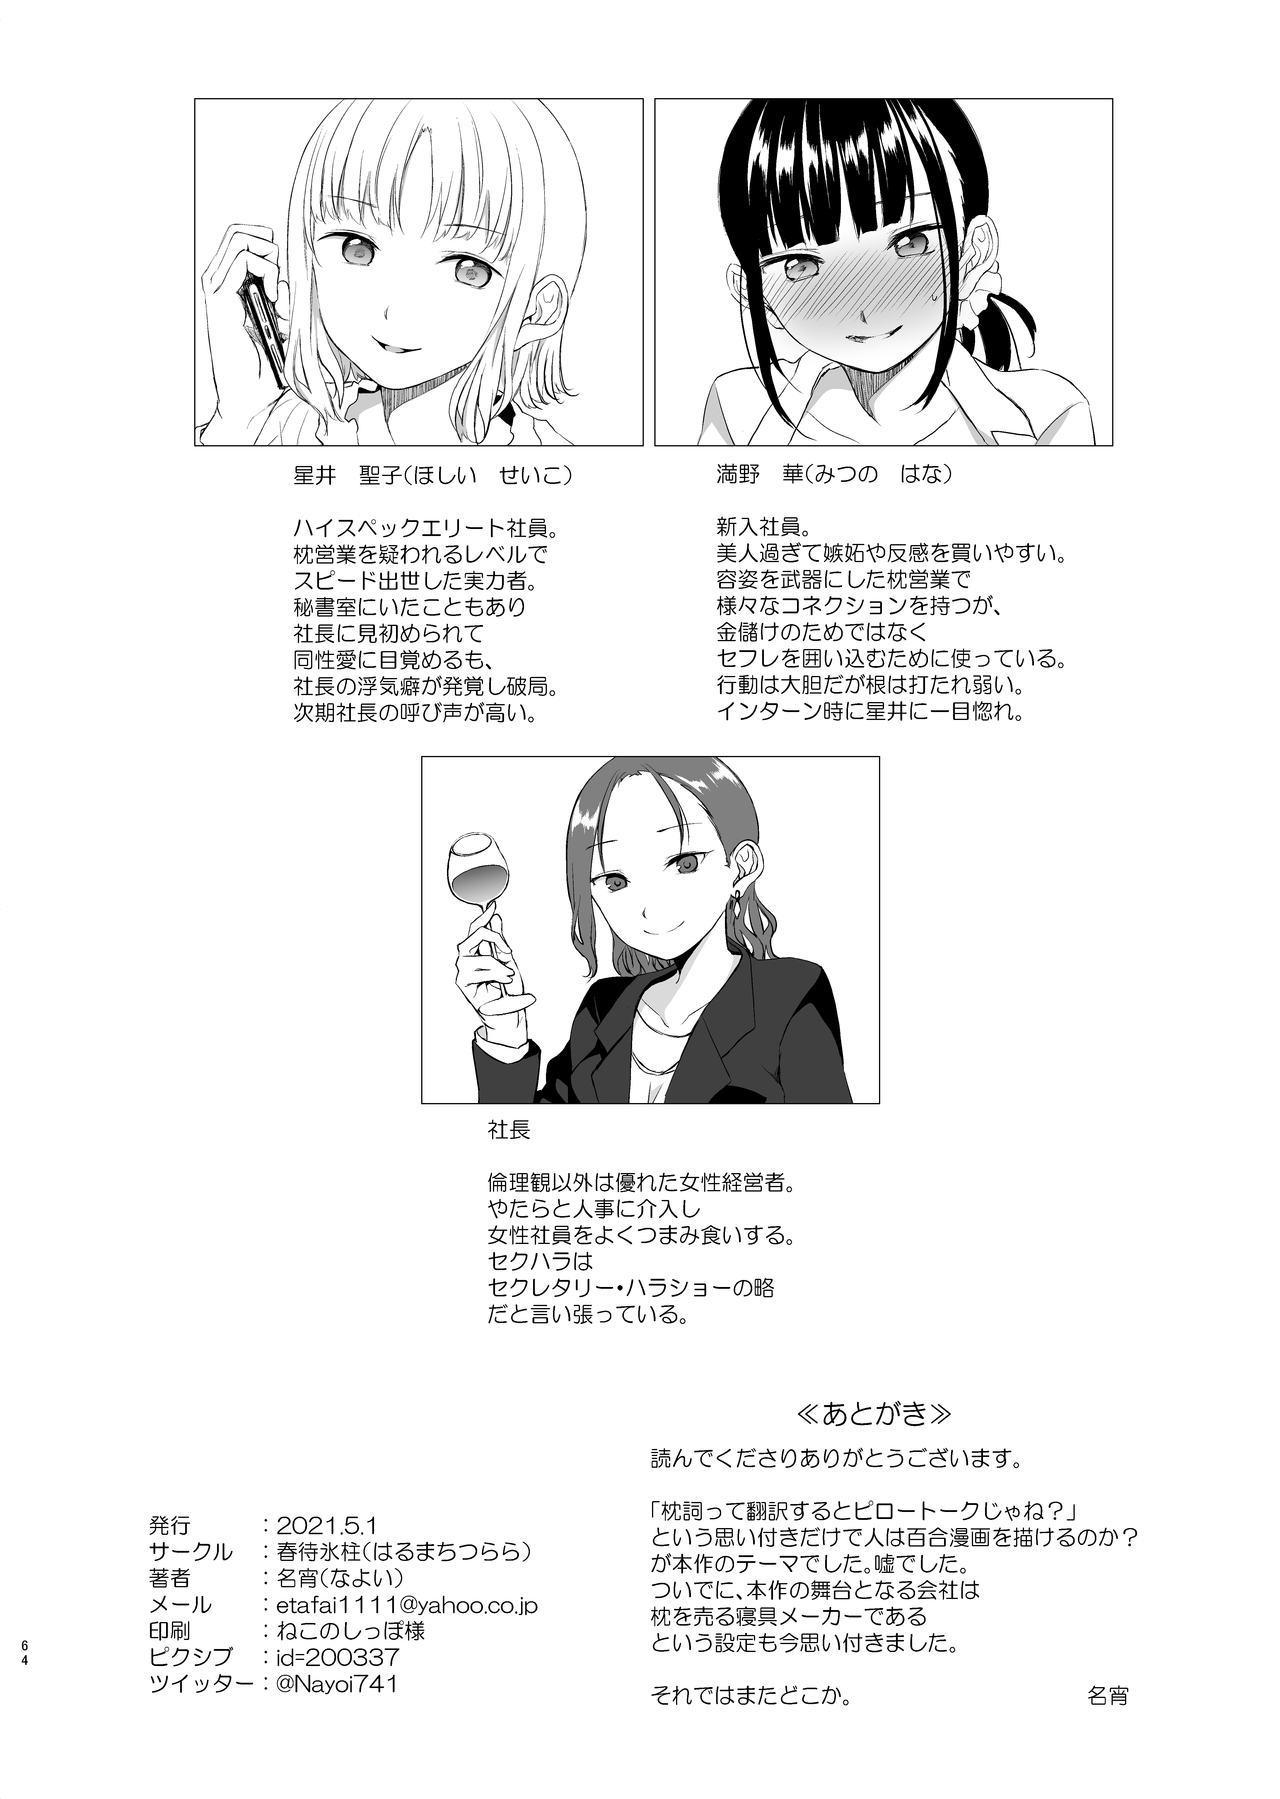 Hanayomi no Makurakotoba 62